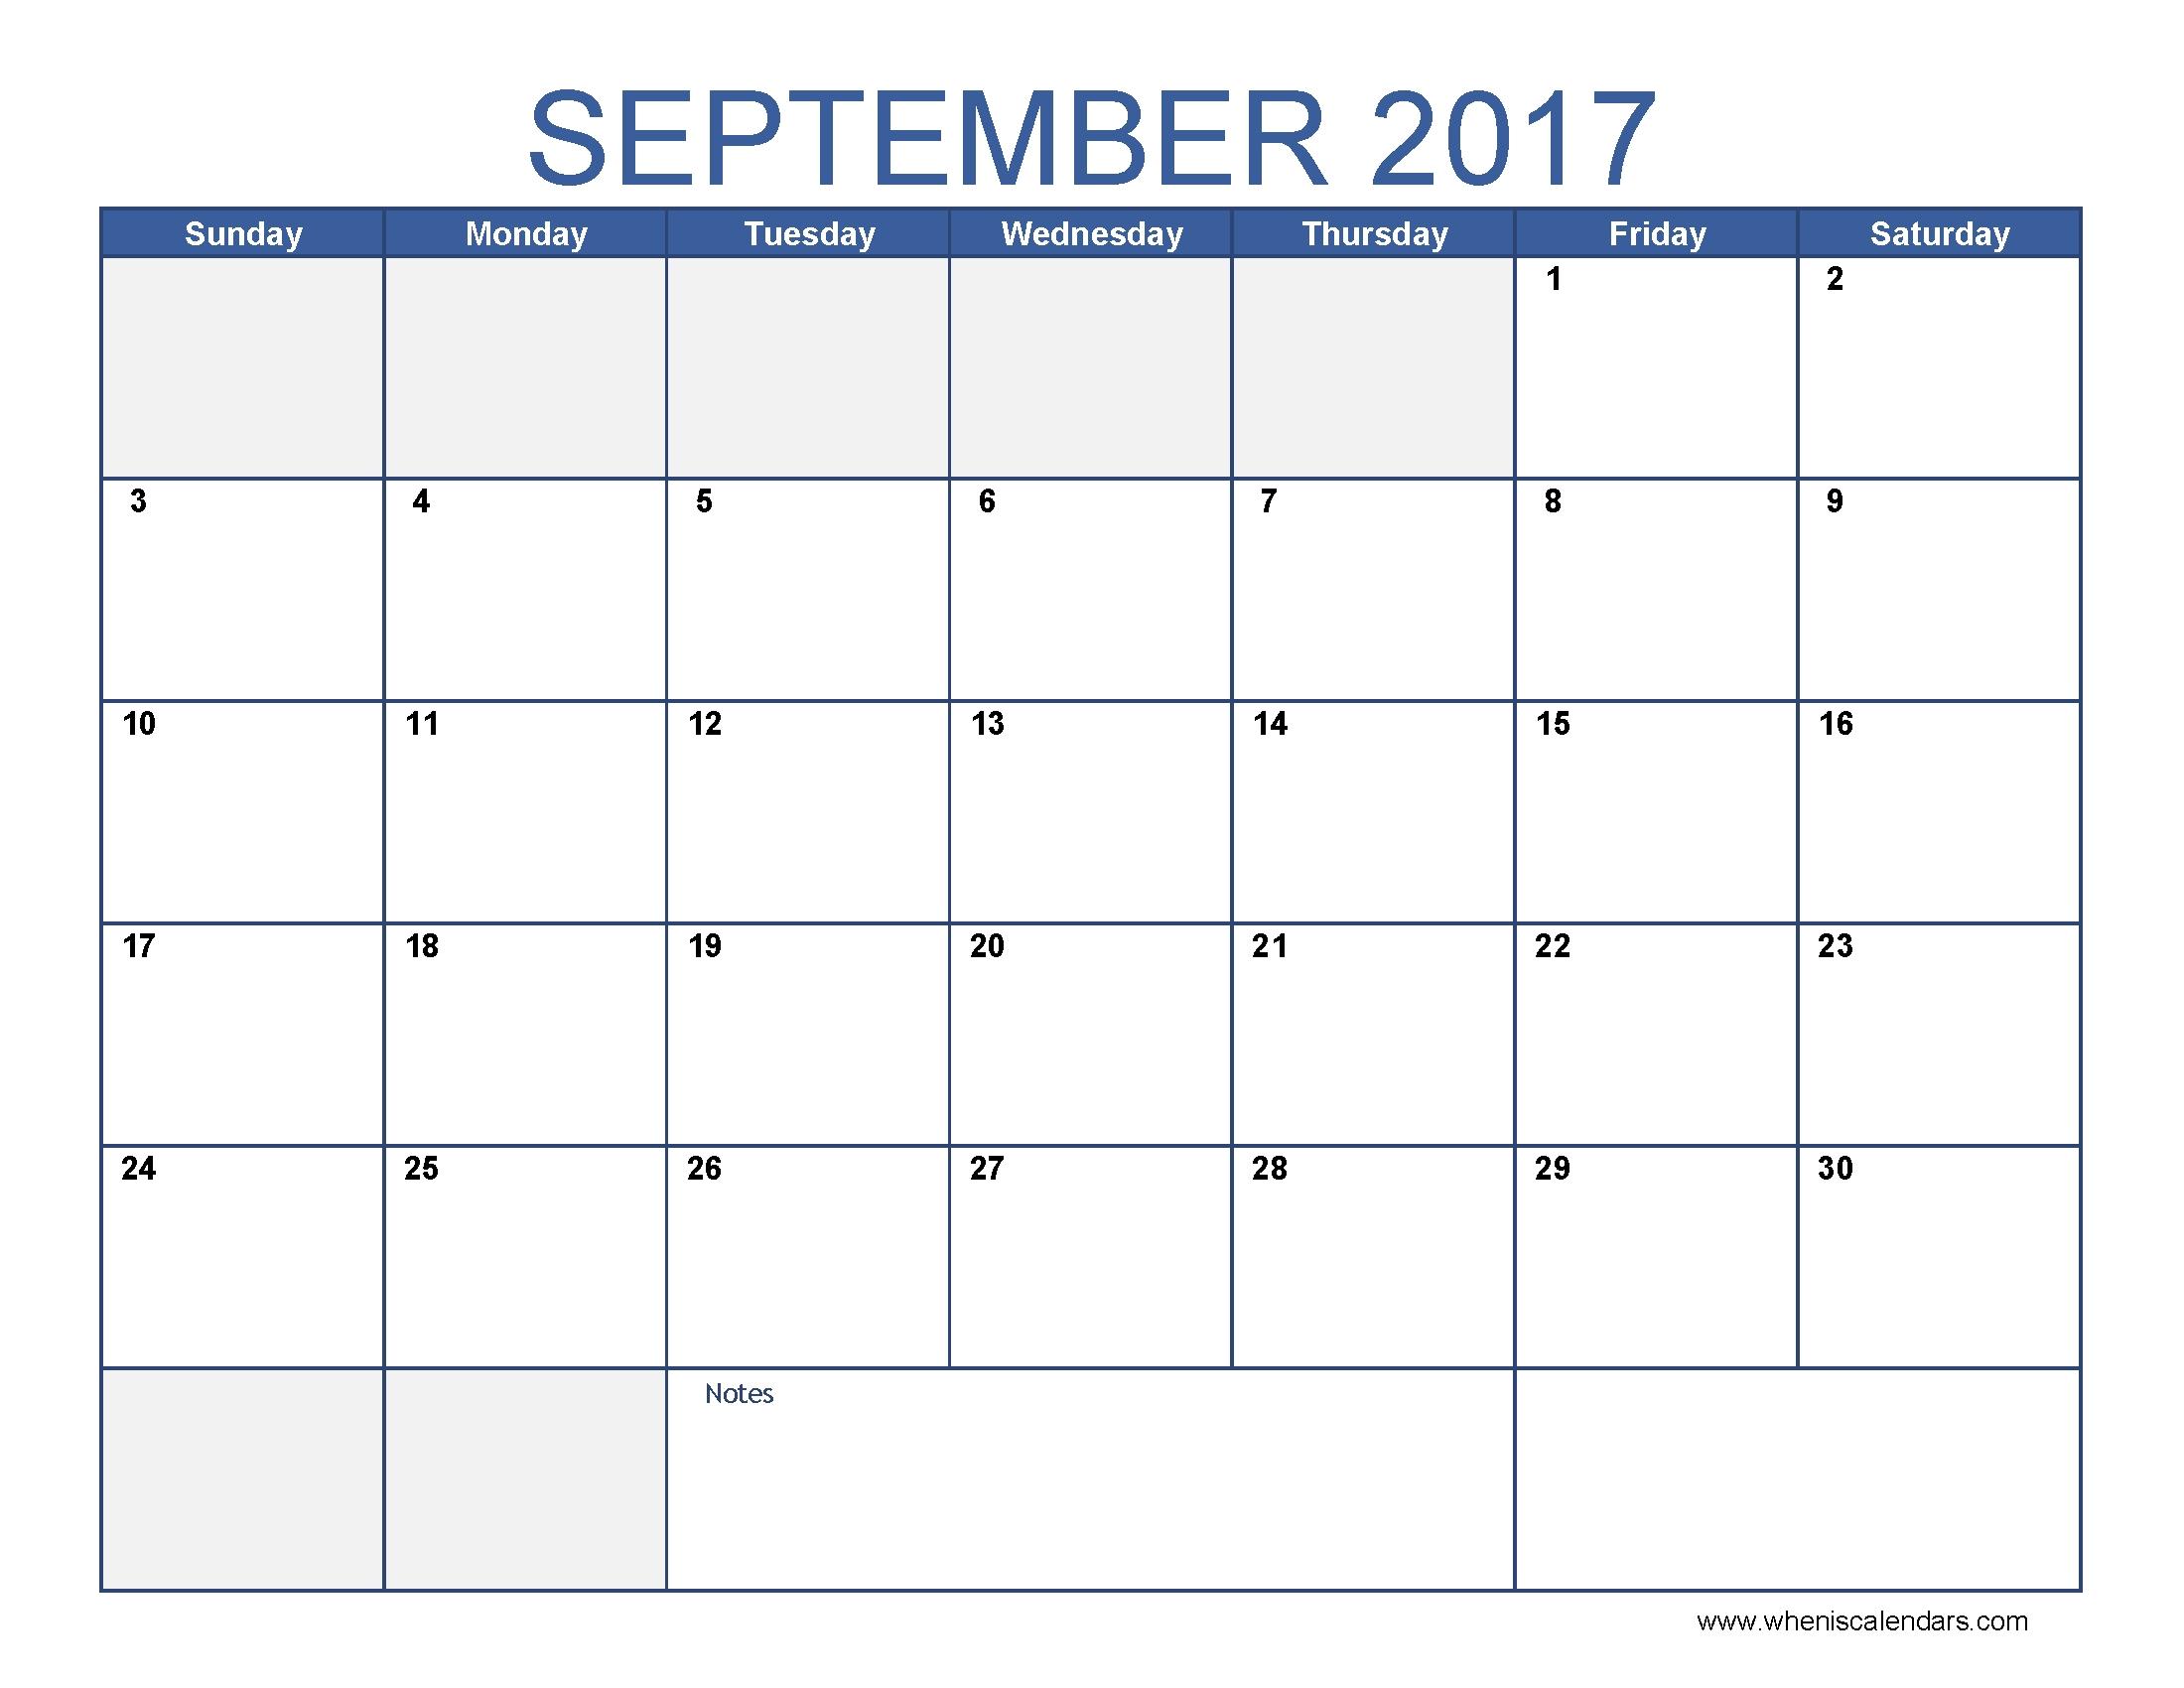 September 2017 Calendar Template Calendar Printable Free  Xjb